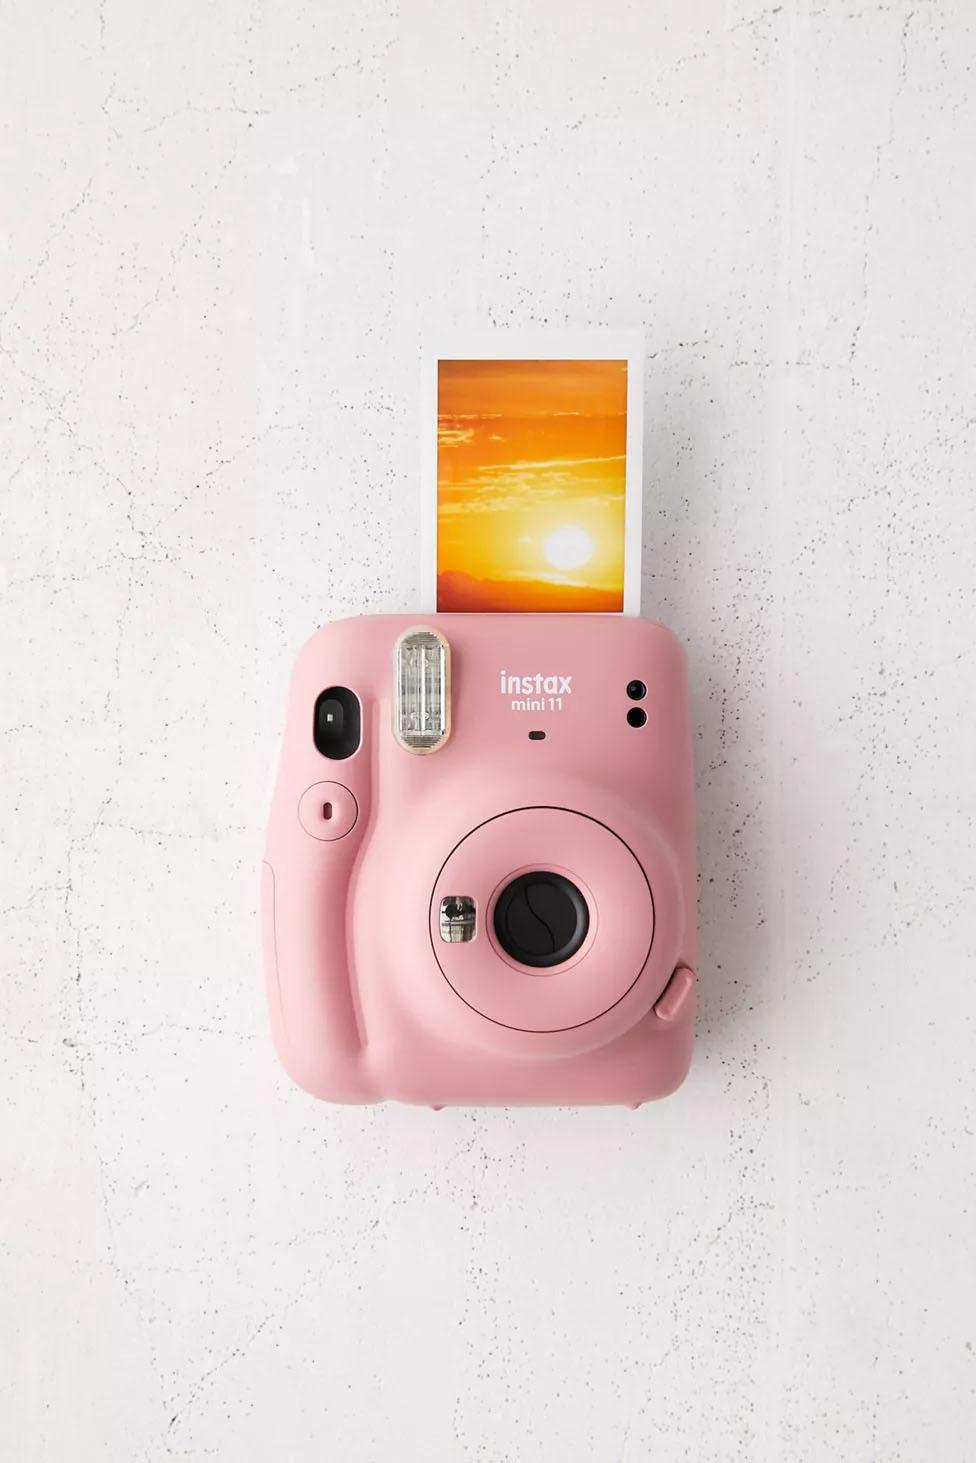 Instax mini Polaroid camera bridesmaids gifts idea